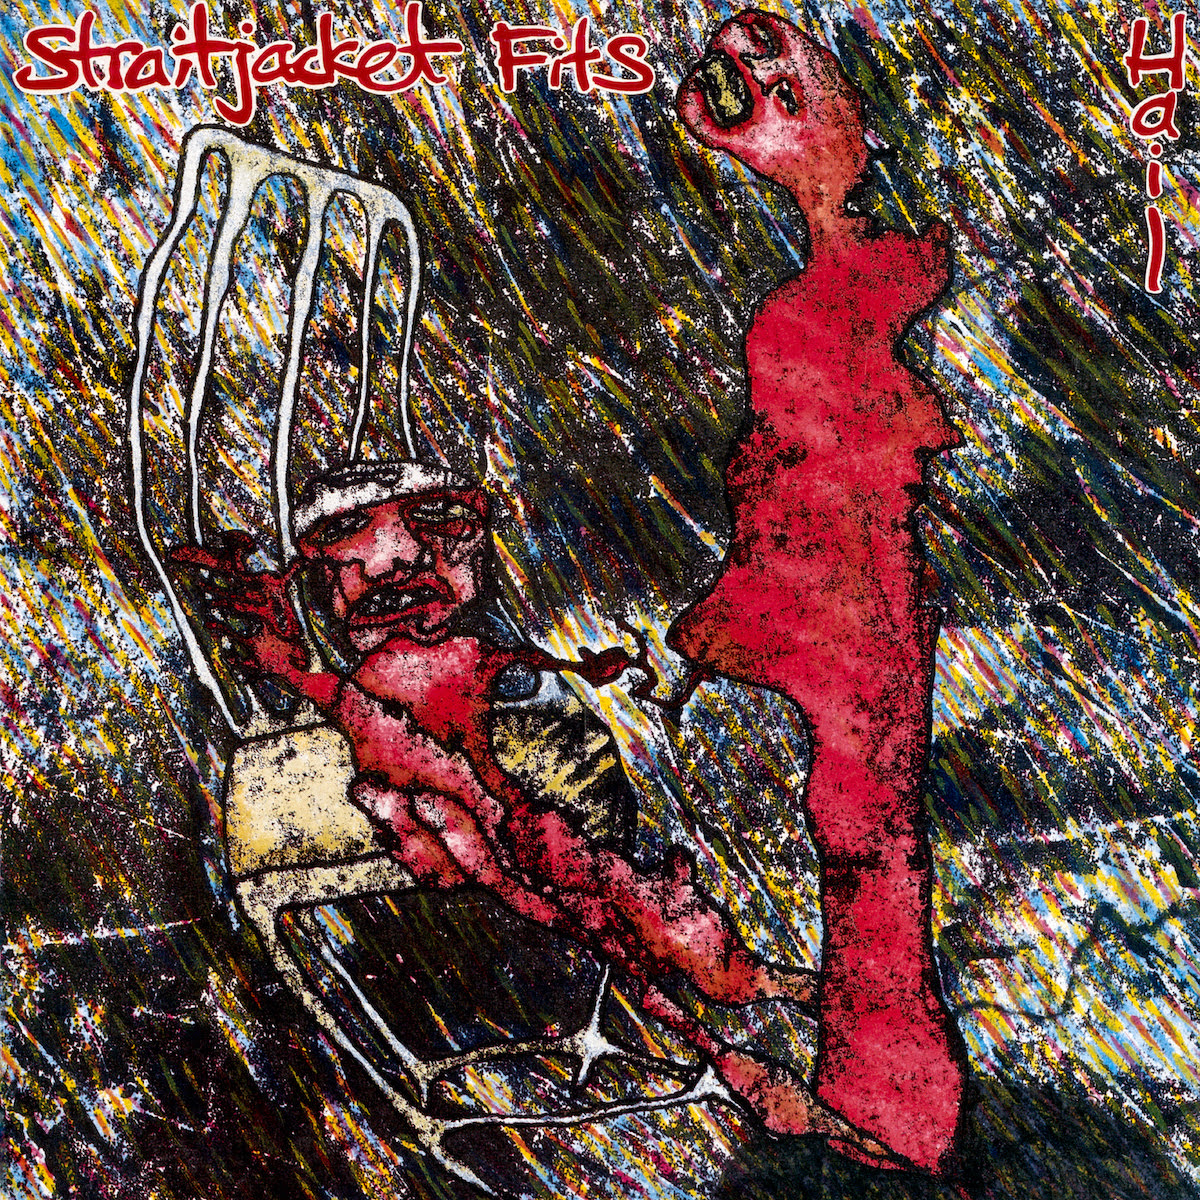 Straitjacket Fits – Hail (2020 reissue)